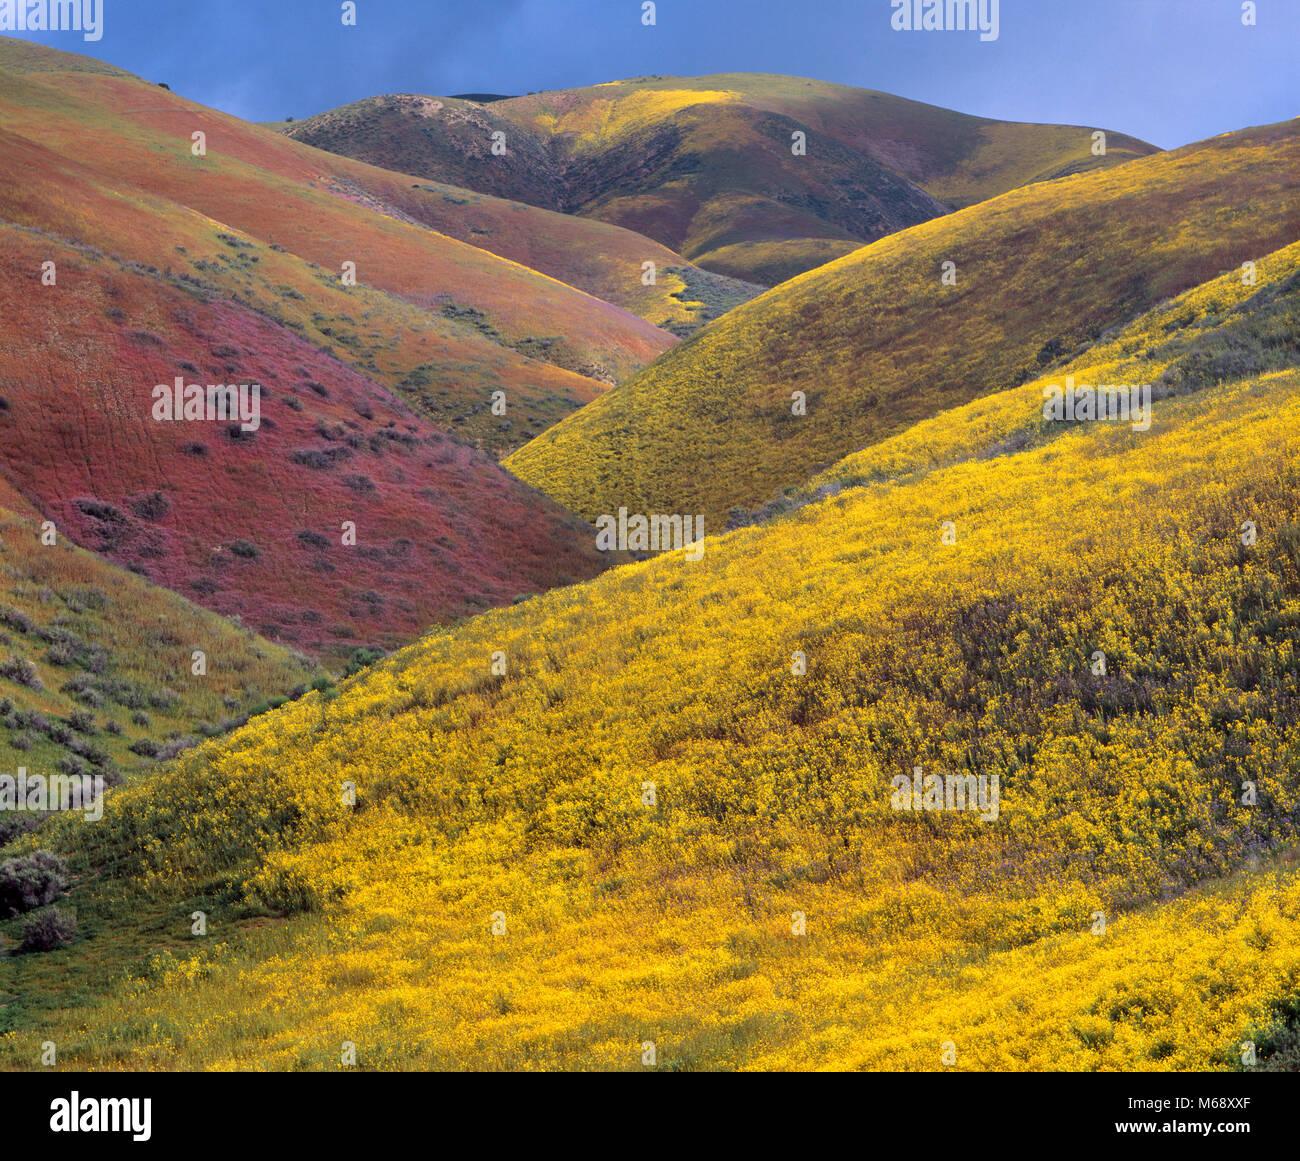 Wildflowers, Tremblor Range, Carrizo Plain National Monument, San Luis Obispo County, California - Stock Image